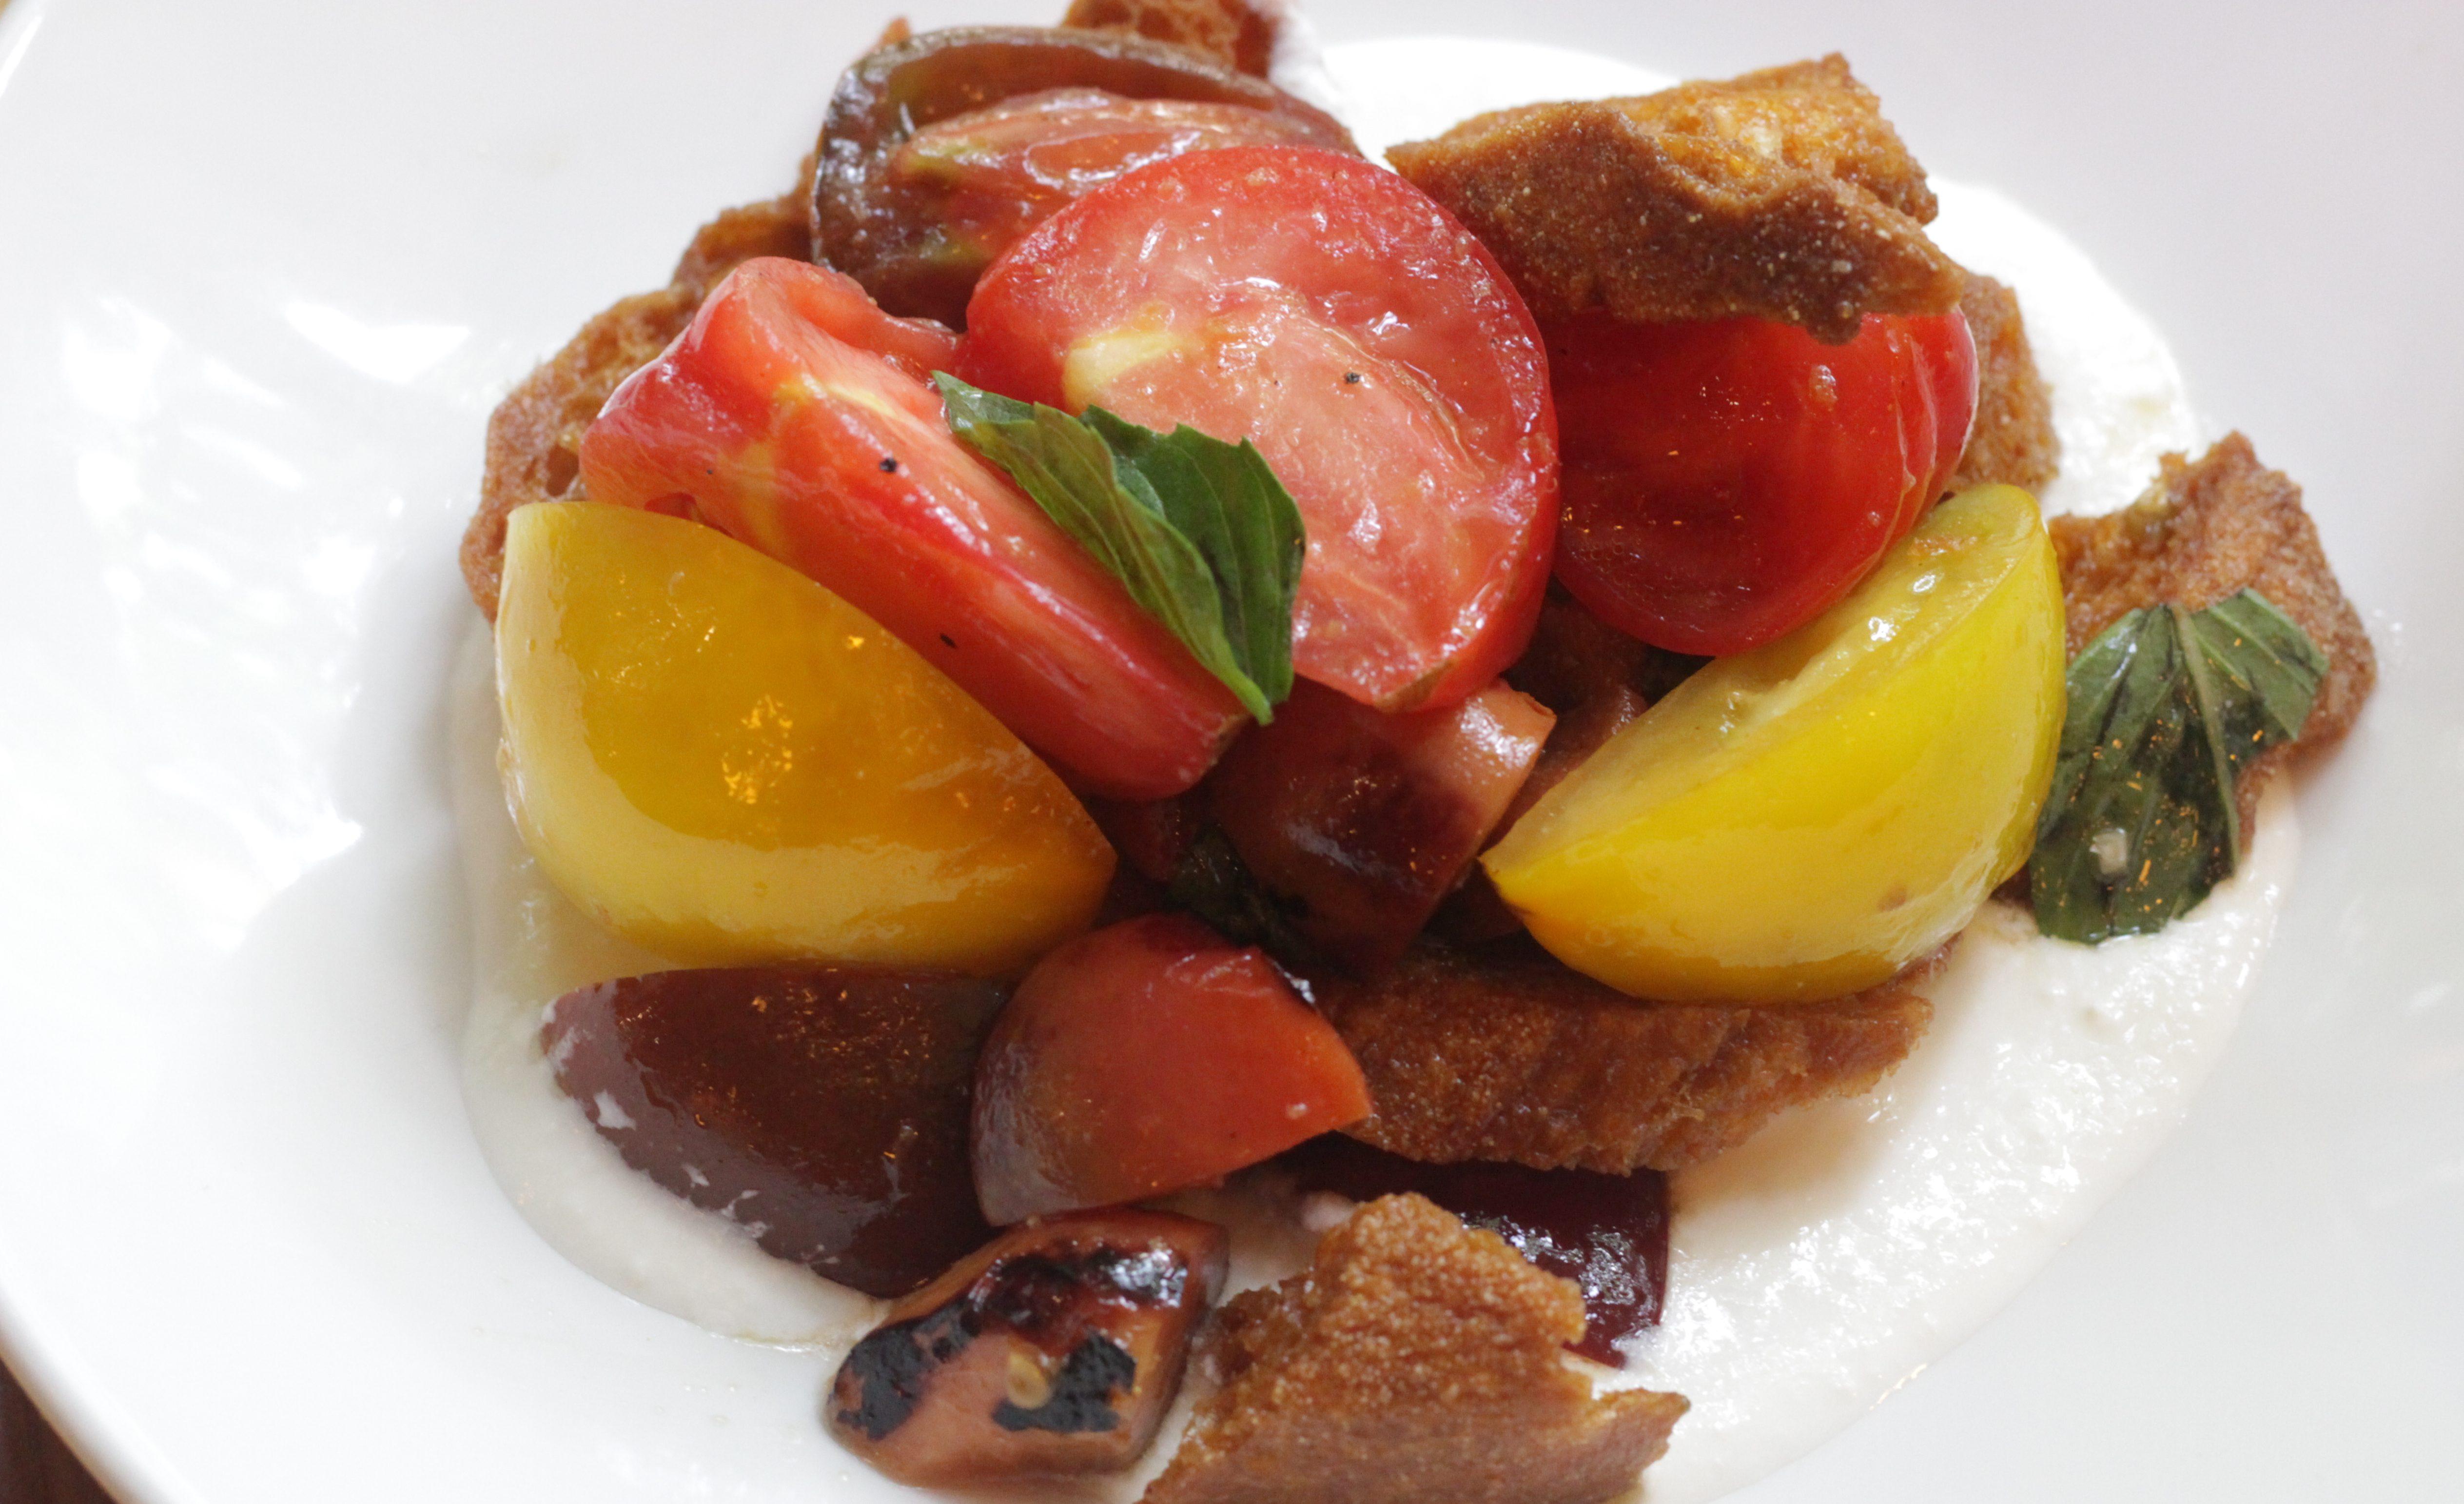 Keen on the Tomato Nectarine Pairing